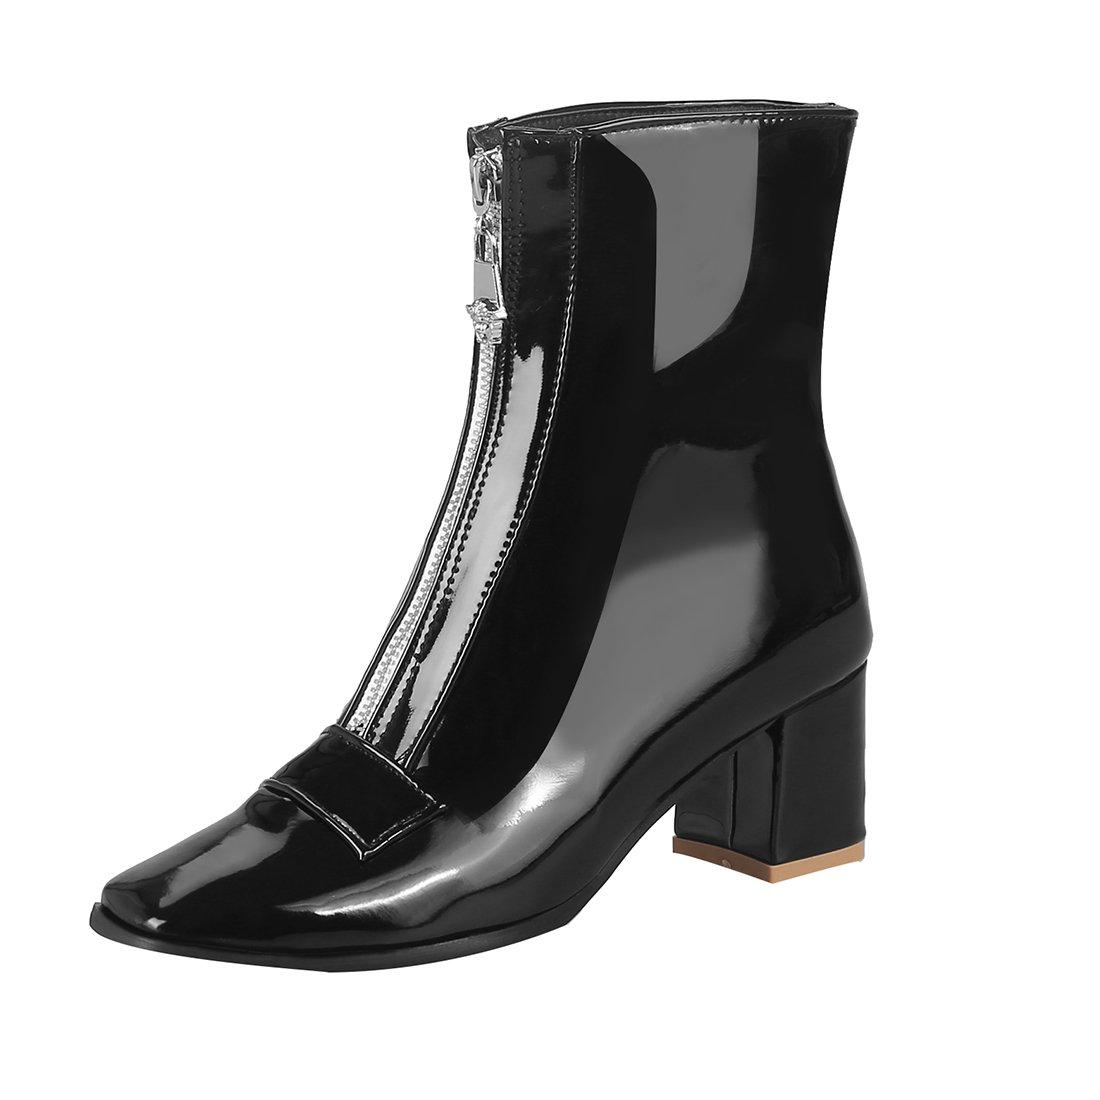 Mee Shoes Damen Reißverschluss chunky heels Plateau Stiefel